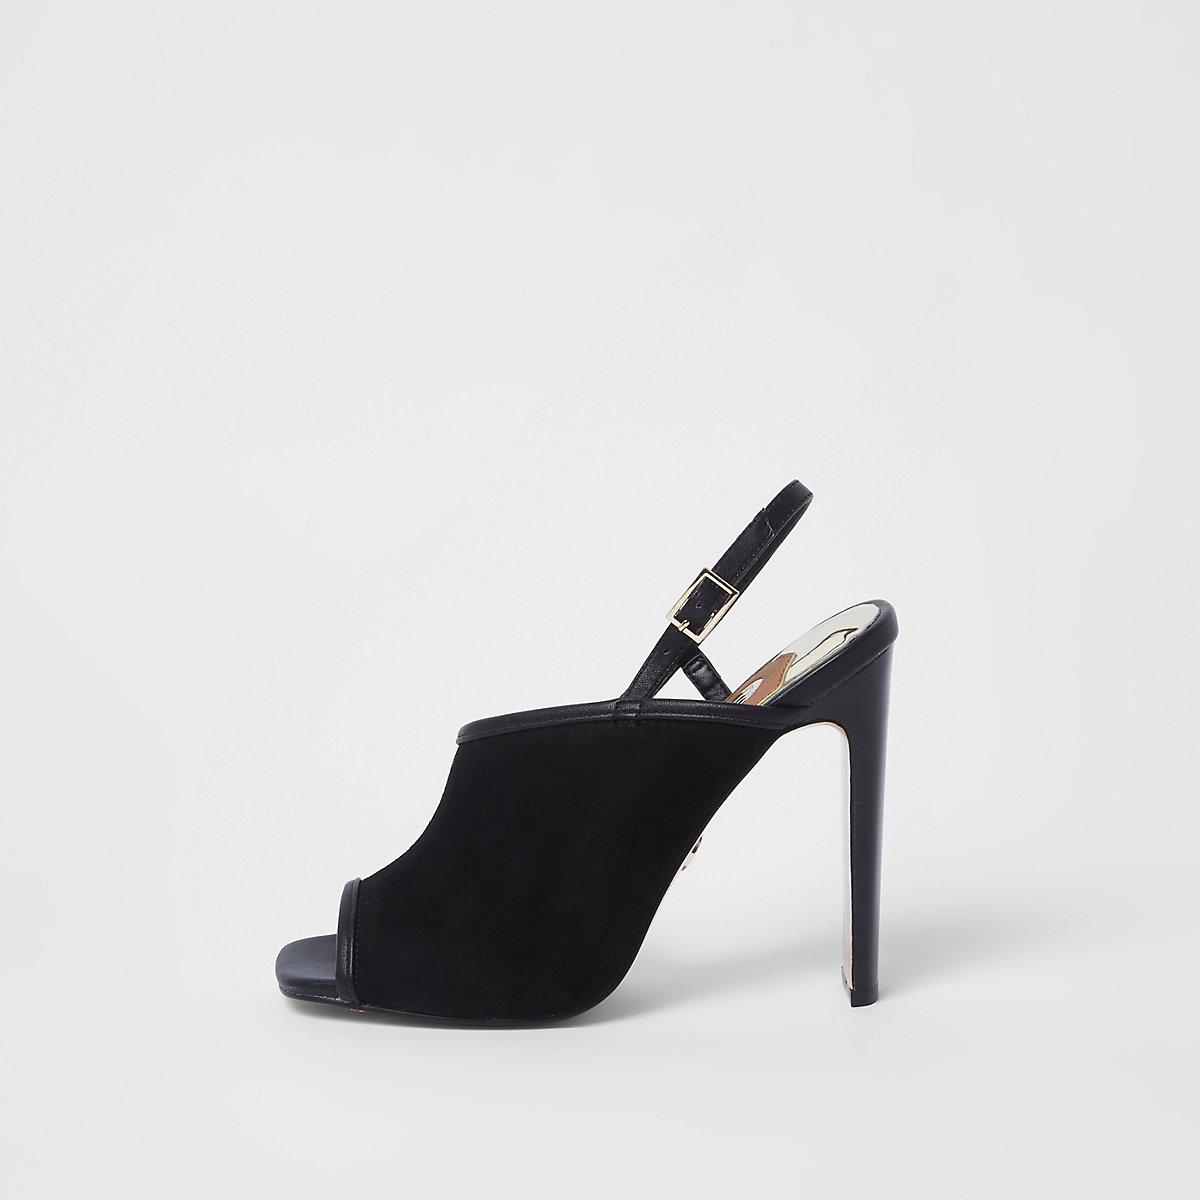 Schwarze, asymmetrische Schuhe